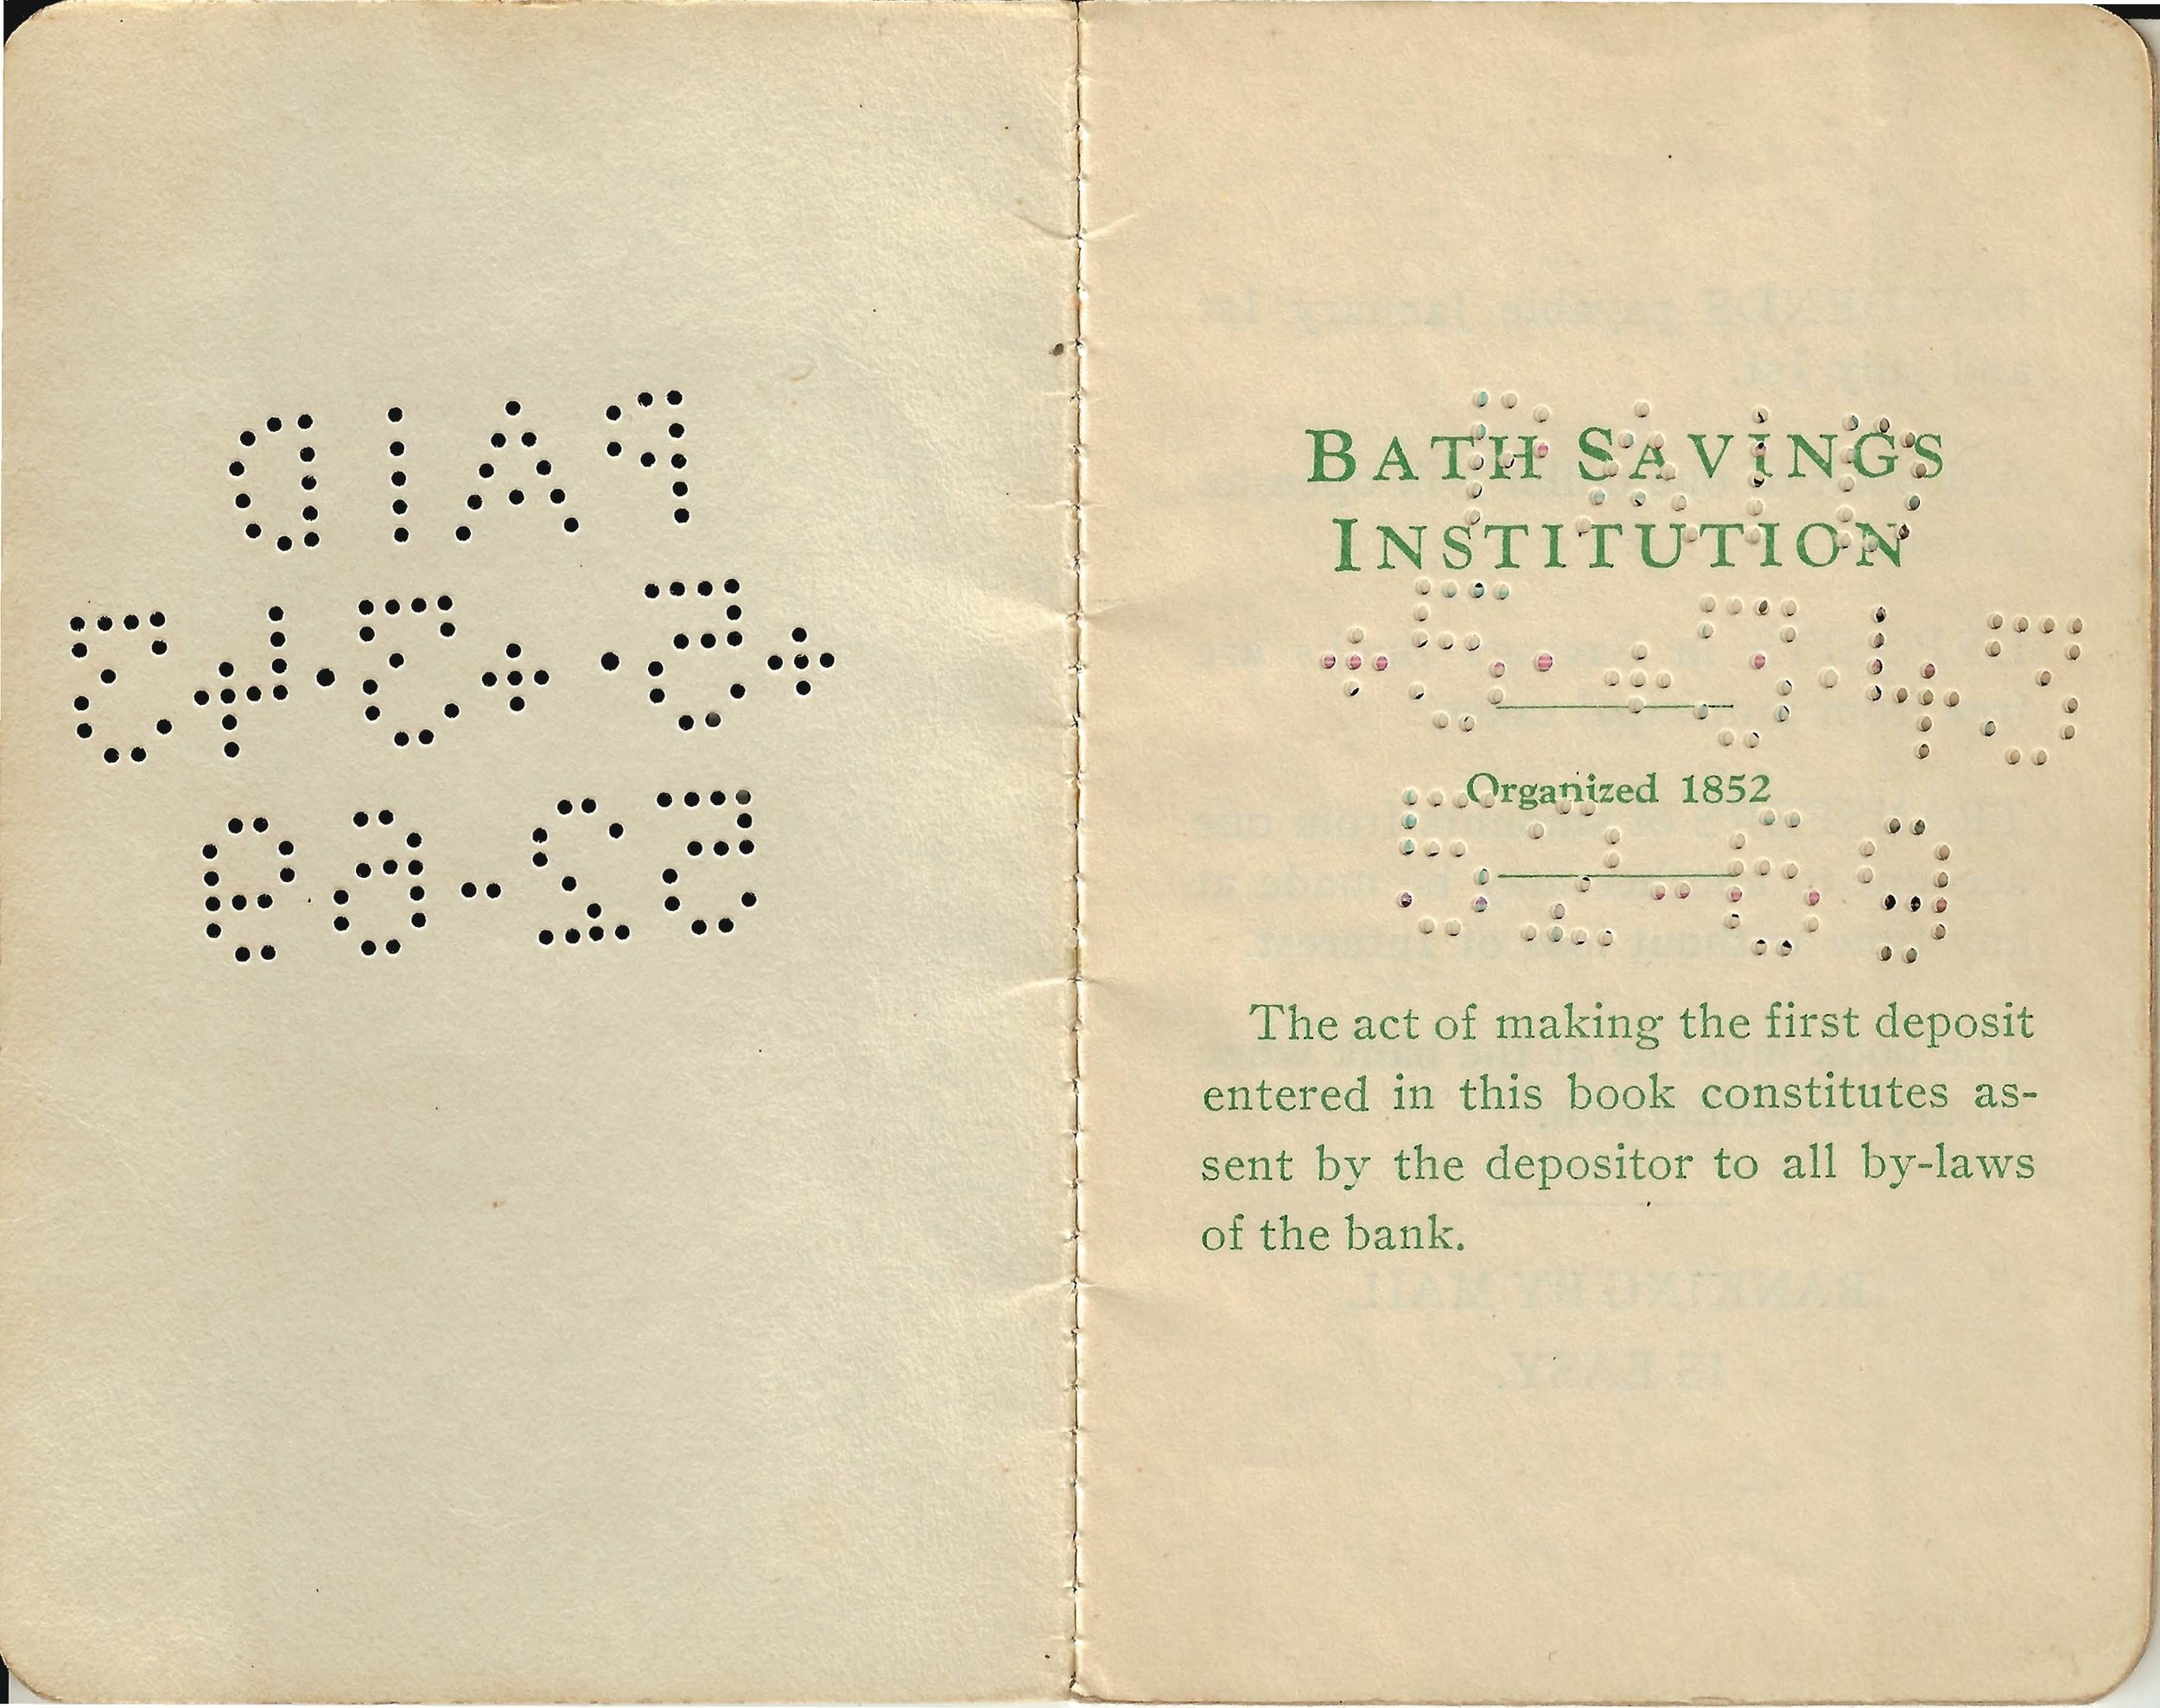 Bath Savings Institution (1933-42)_Page_02.jpg